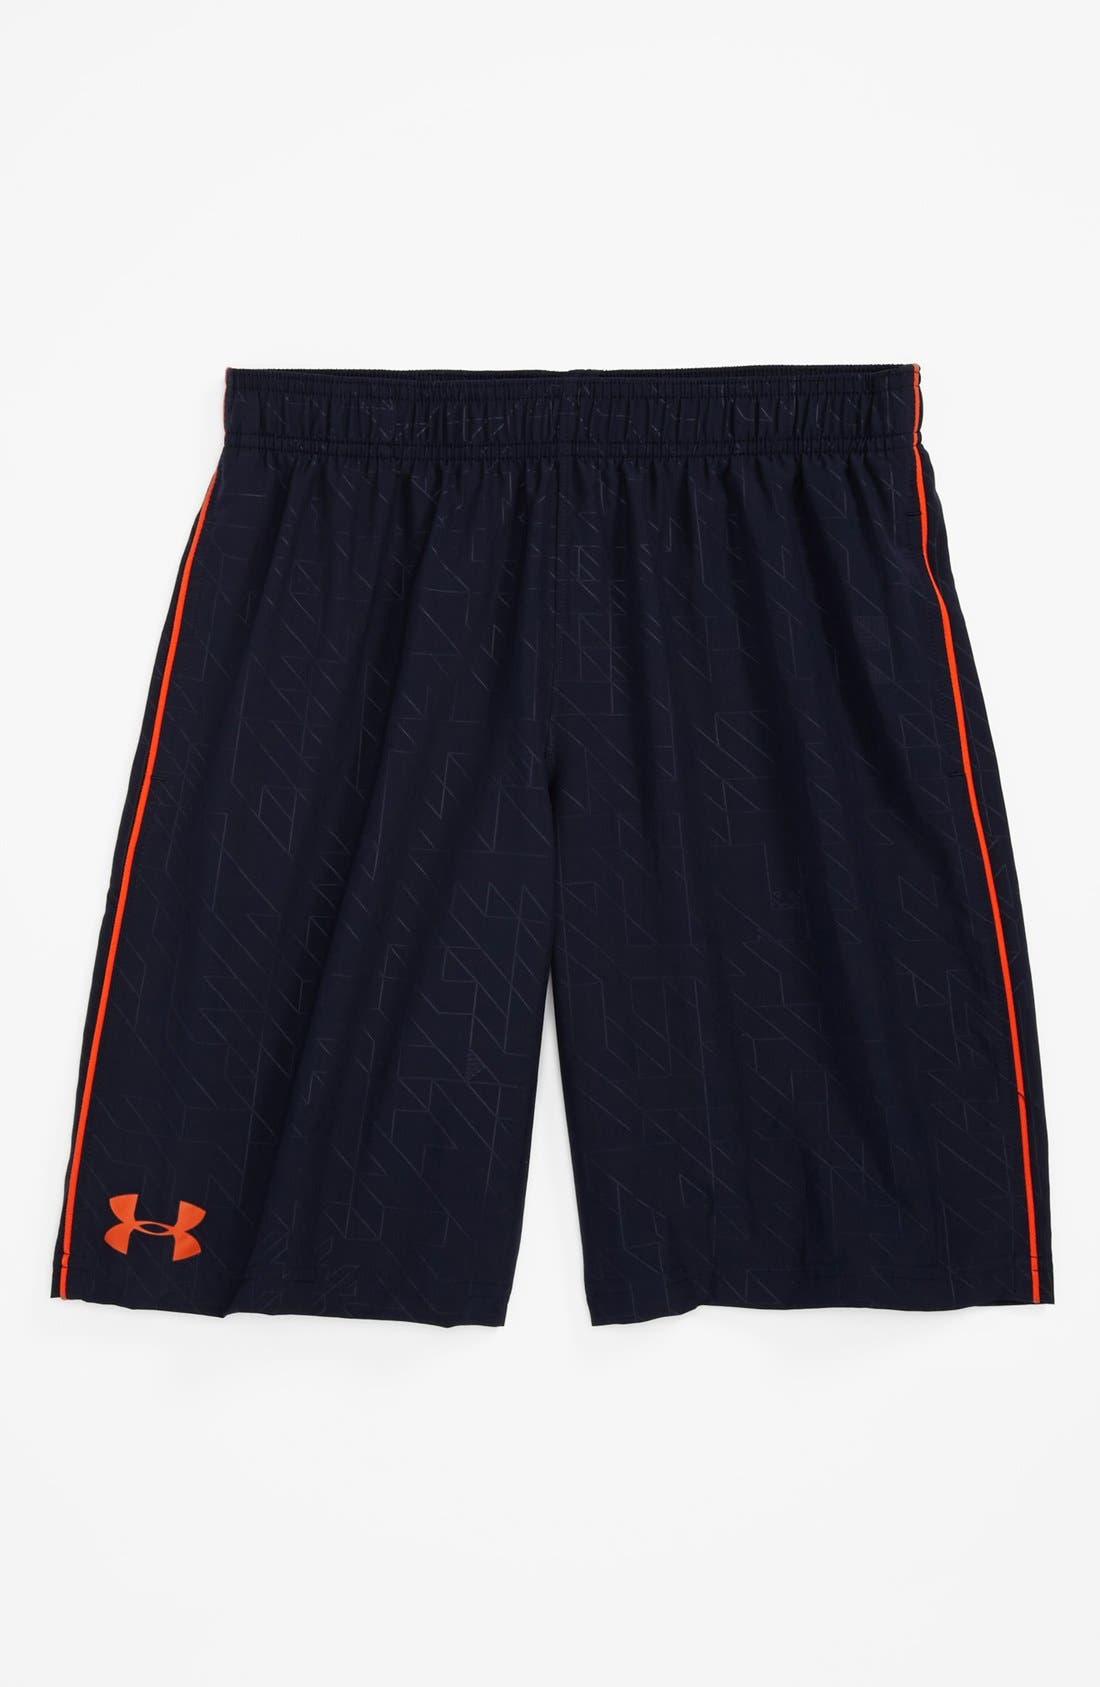 Alternate Image 1 Selected - Under Armour 'Ultimate' HeatGear® Shorts (Big Boys)